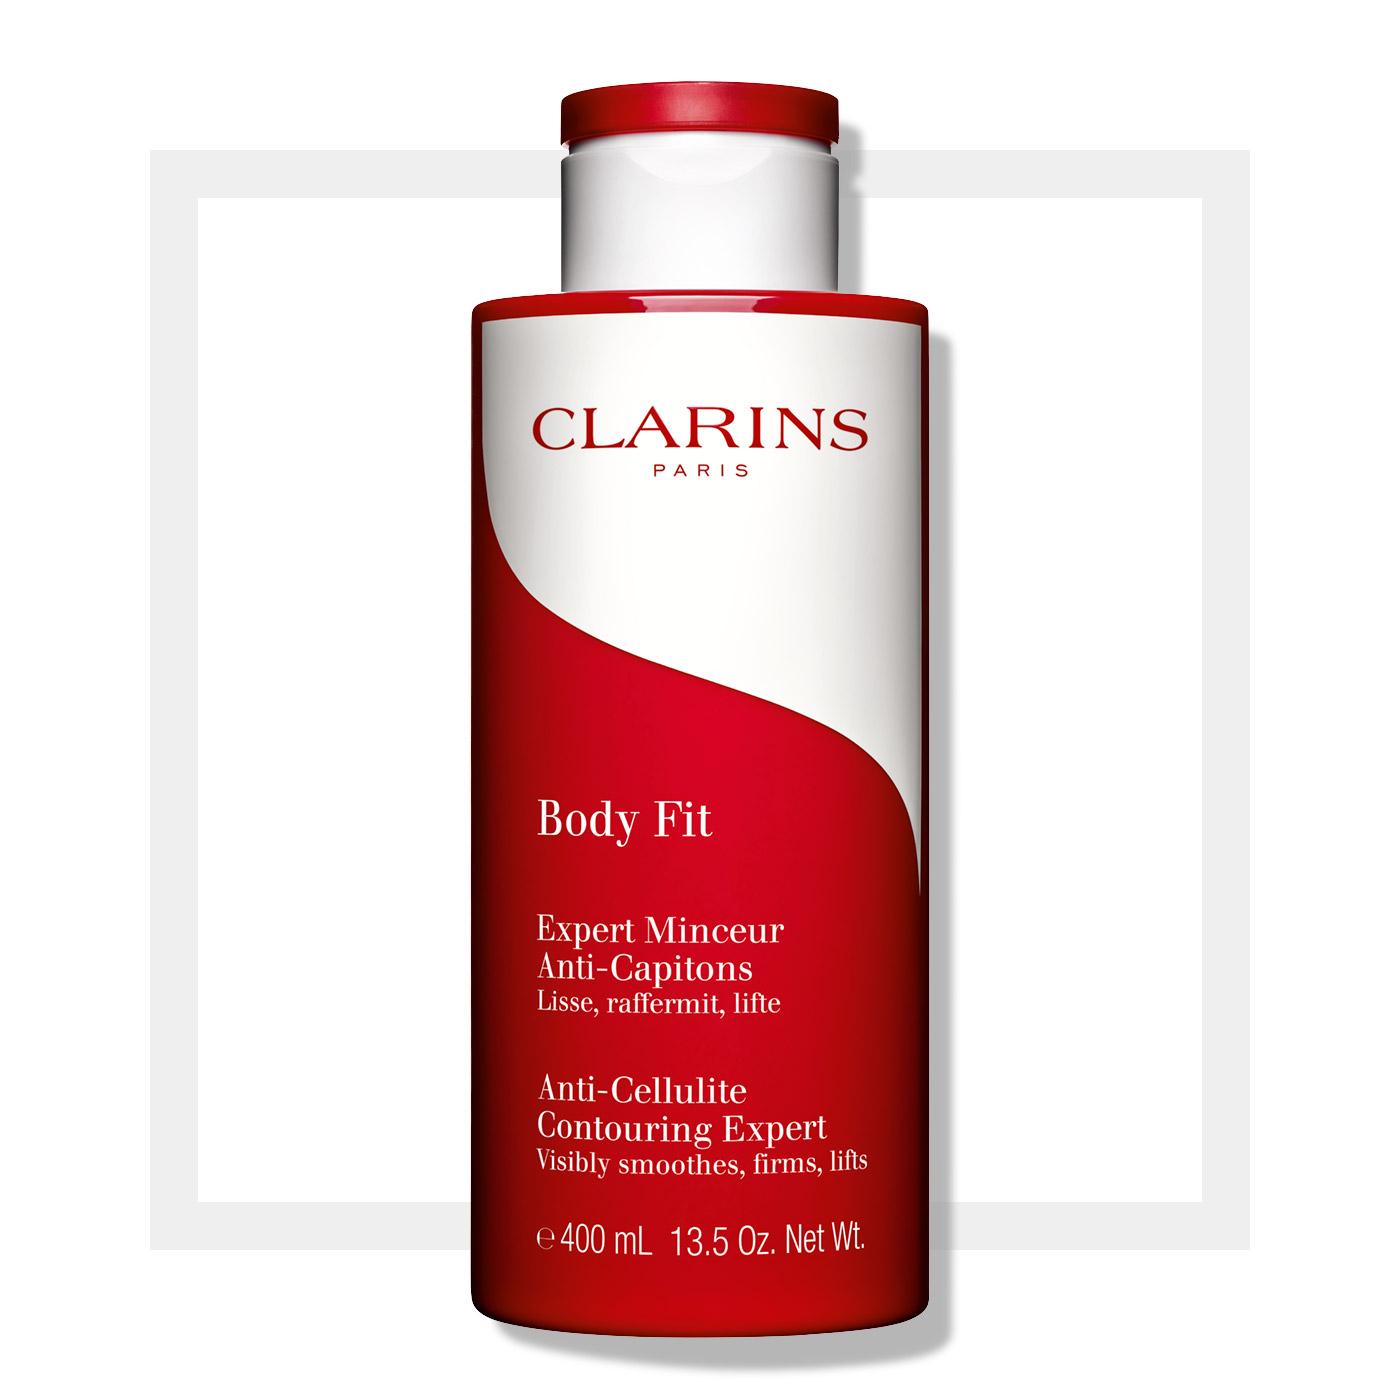 Body fit anti cellulite contouring expert anti cellulite - Salon body body paris ...